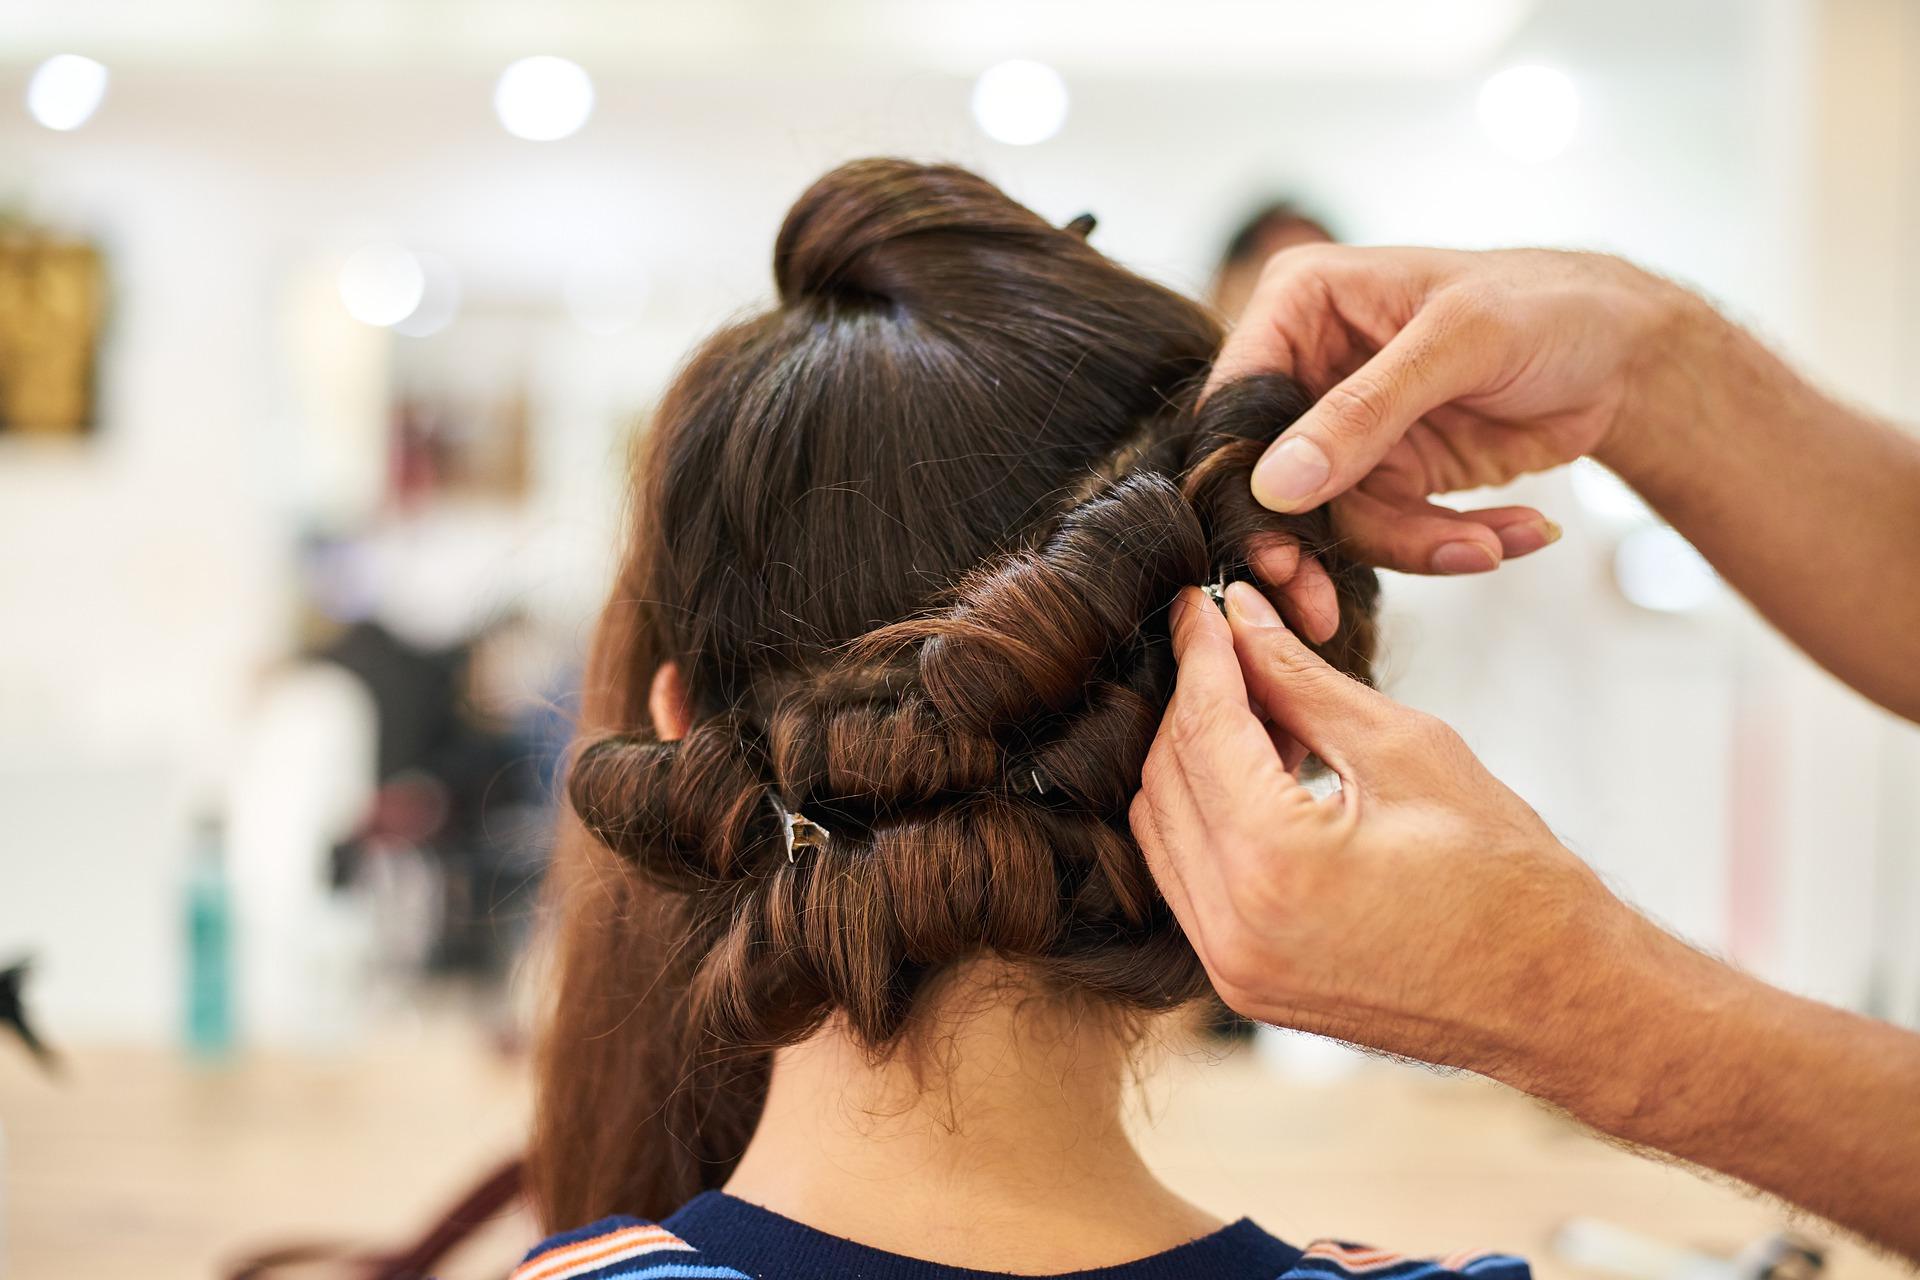 hair-4556496_1920